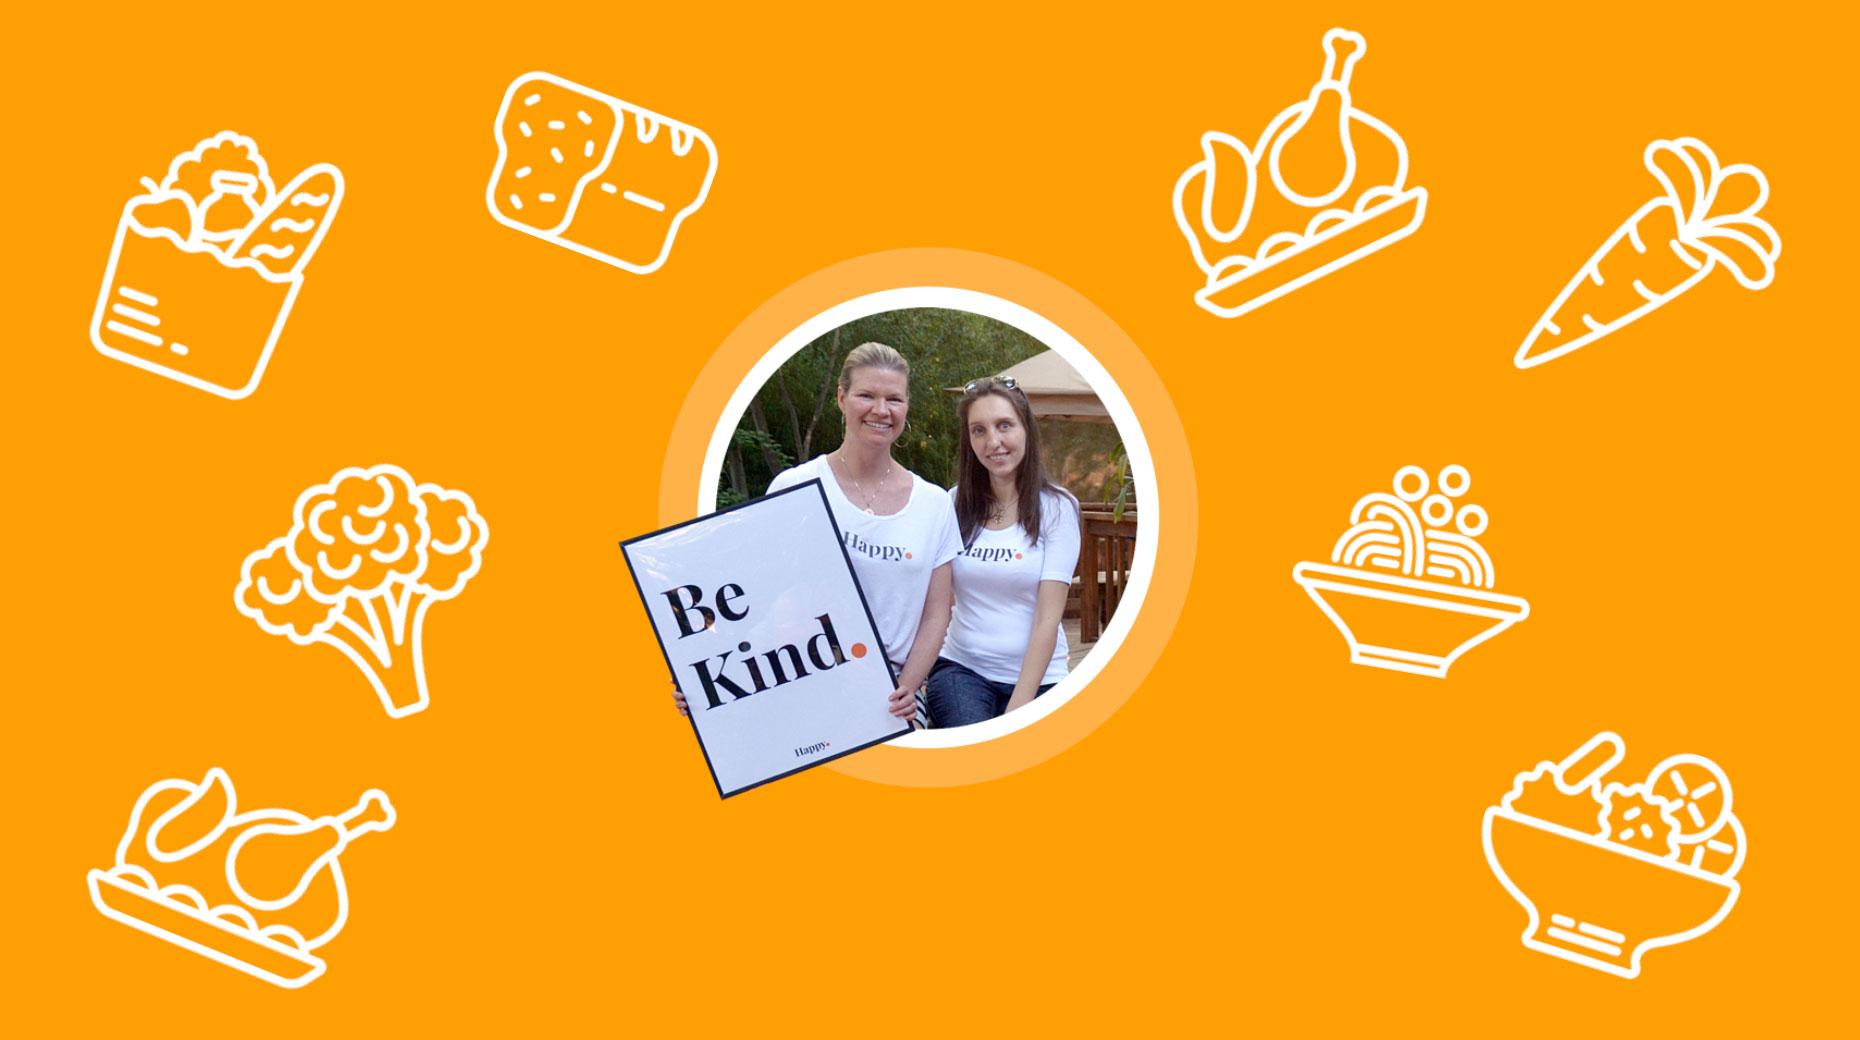 Founders of Happy Orange Project